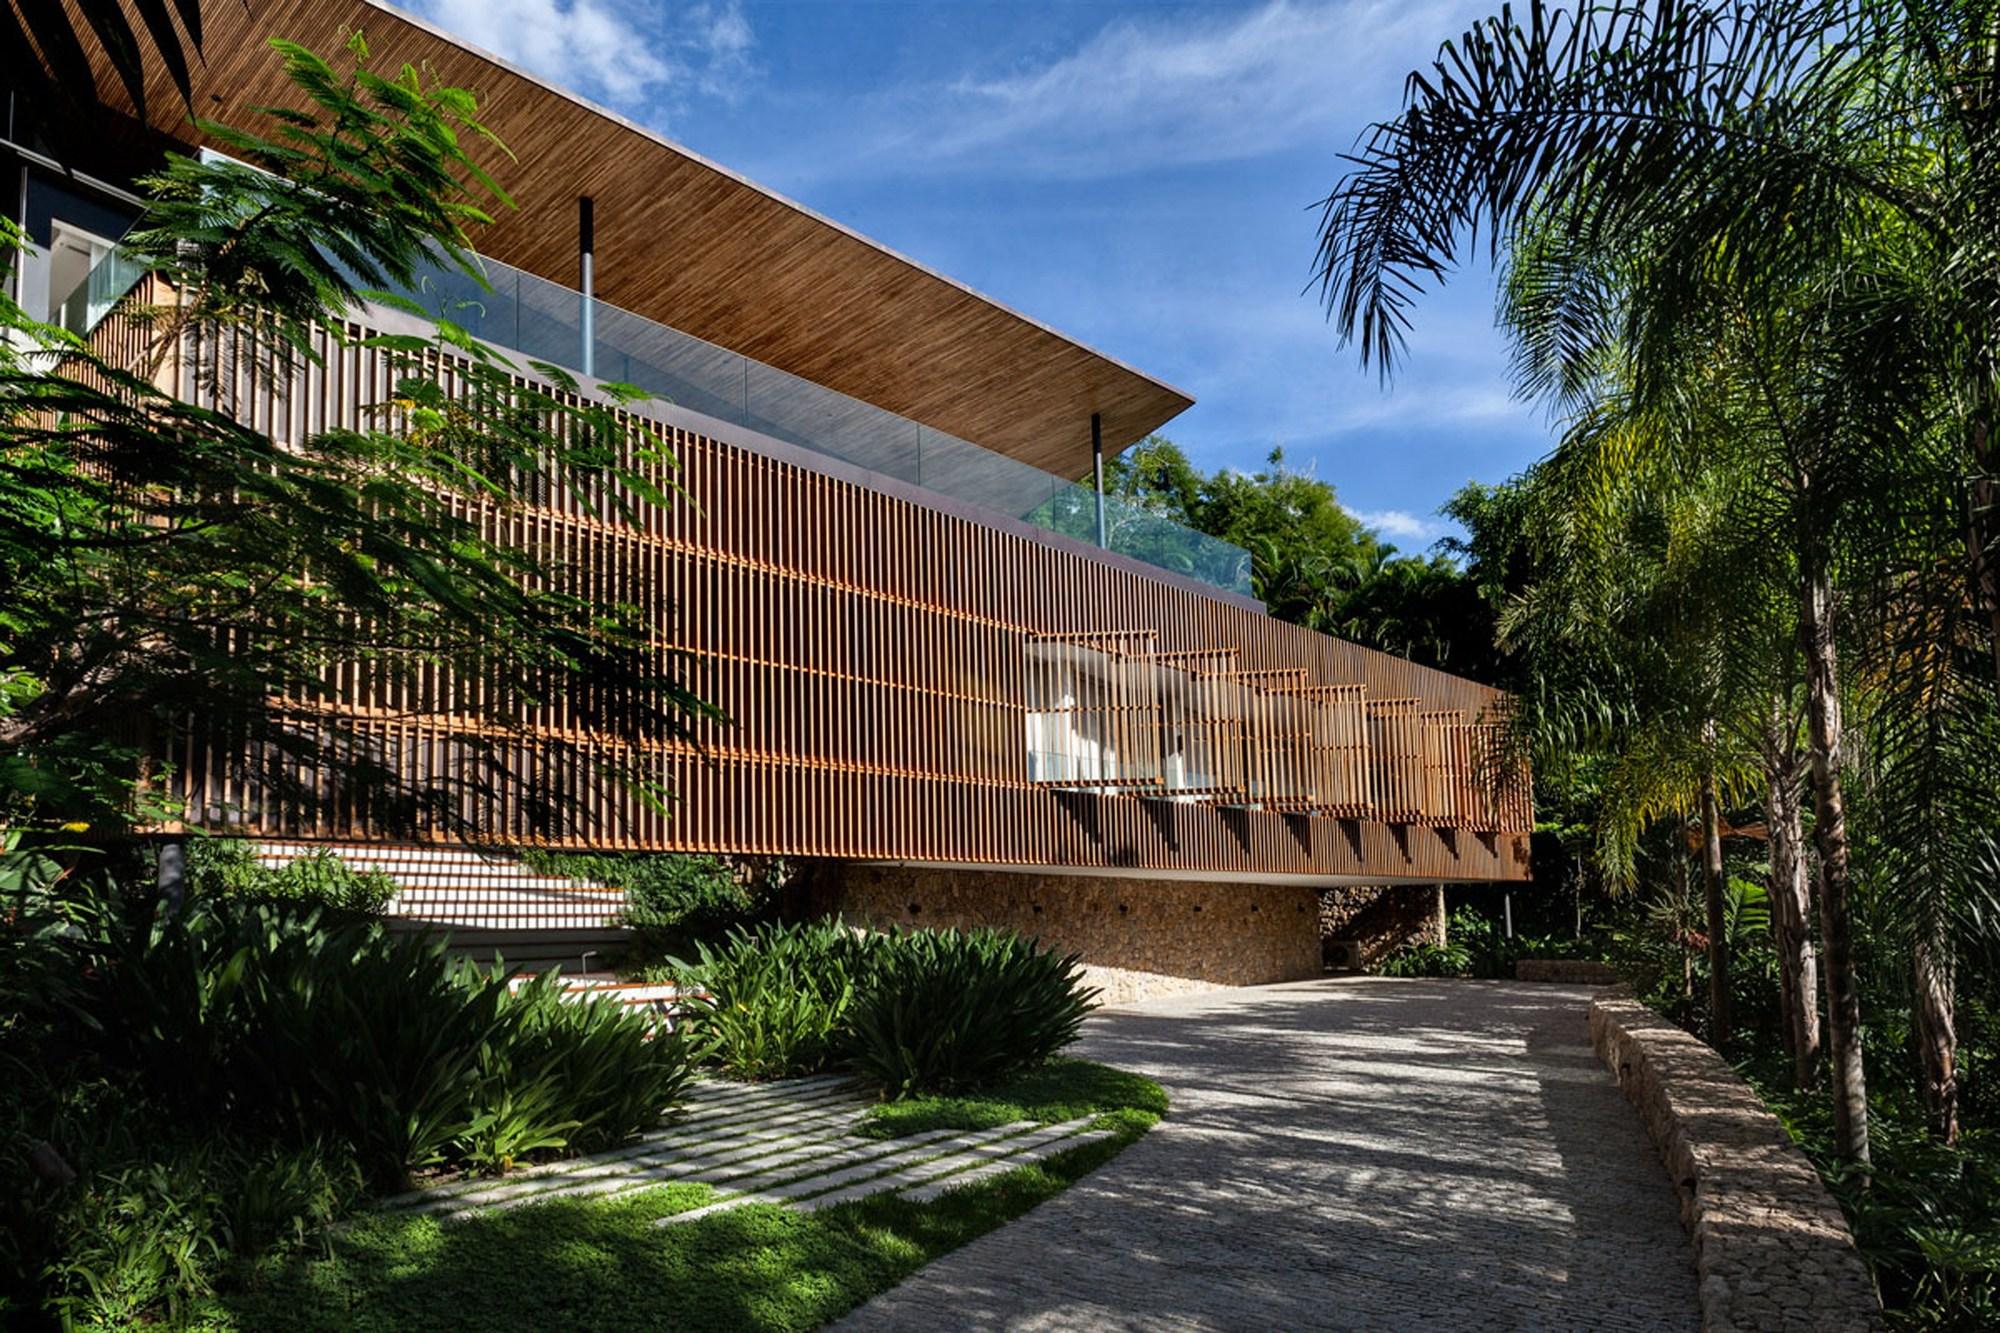 Casa delta bernardes arquitetura plataforma arquitectura for Fotos de casas modernas brasileiras